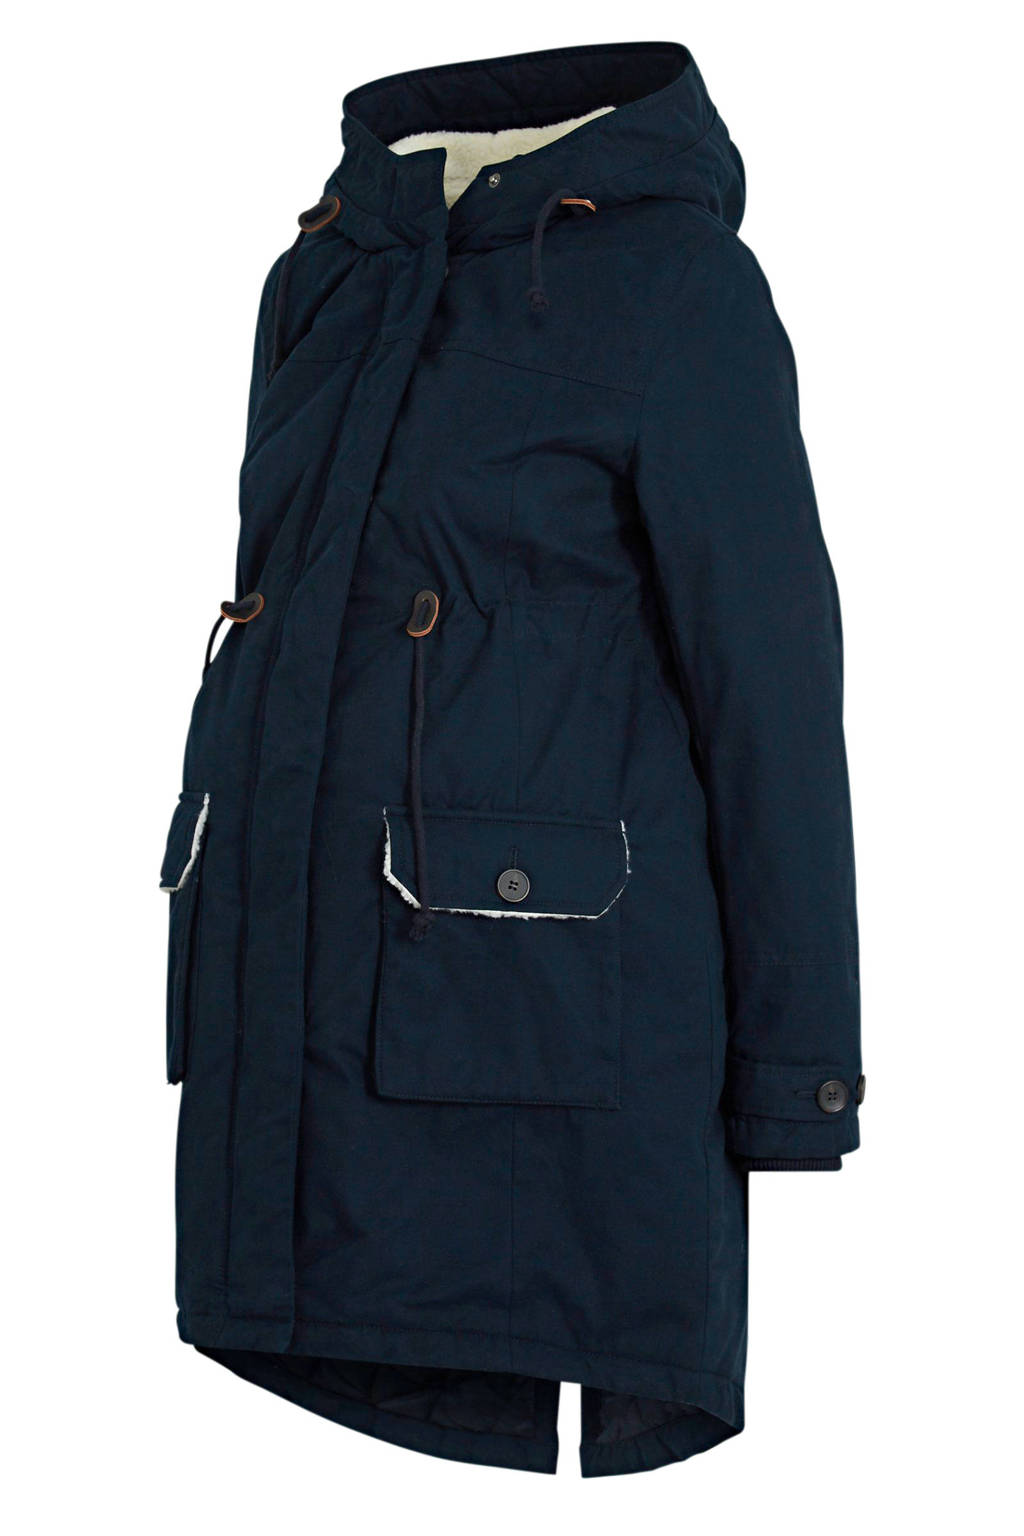 C&A Yessica zwangerschaps winterparka donkerblauw - draagjas, Donkerblauw